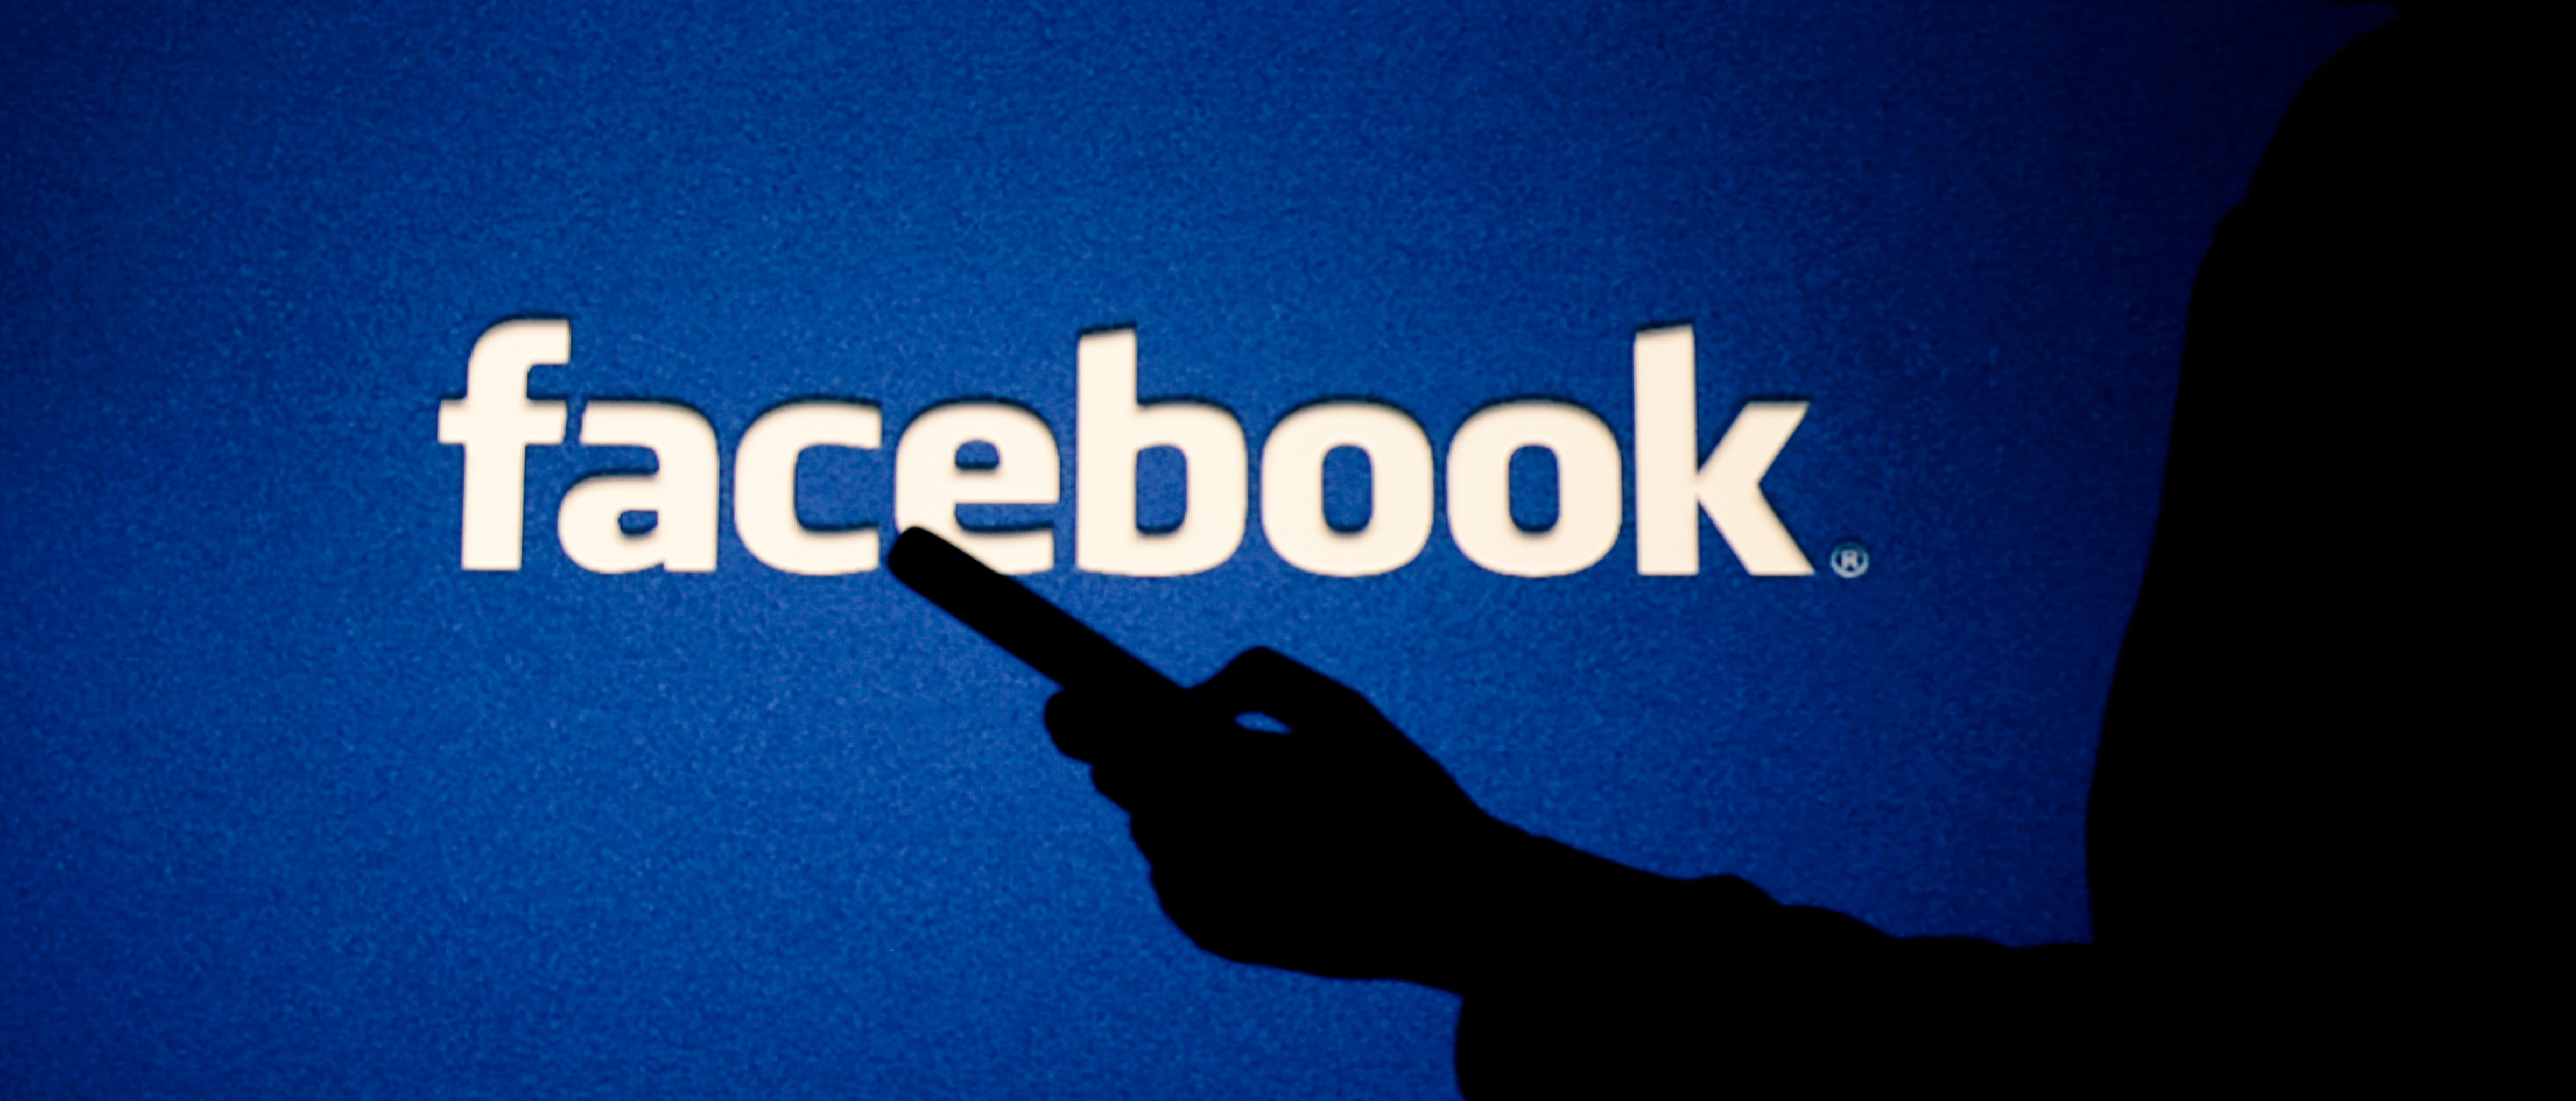 Facebook Sued Shutterstock